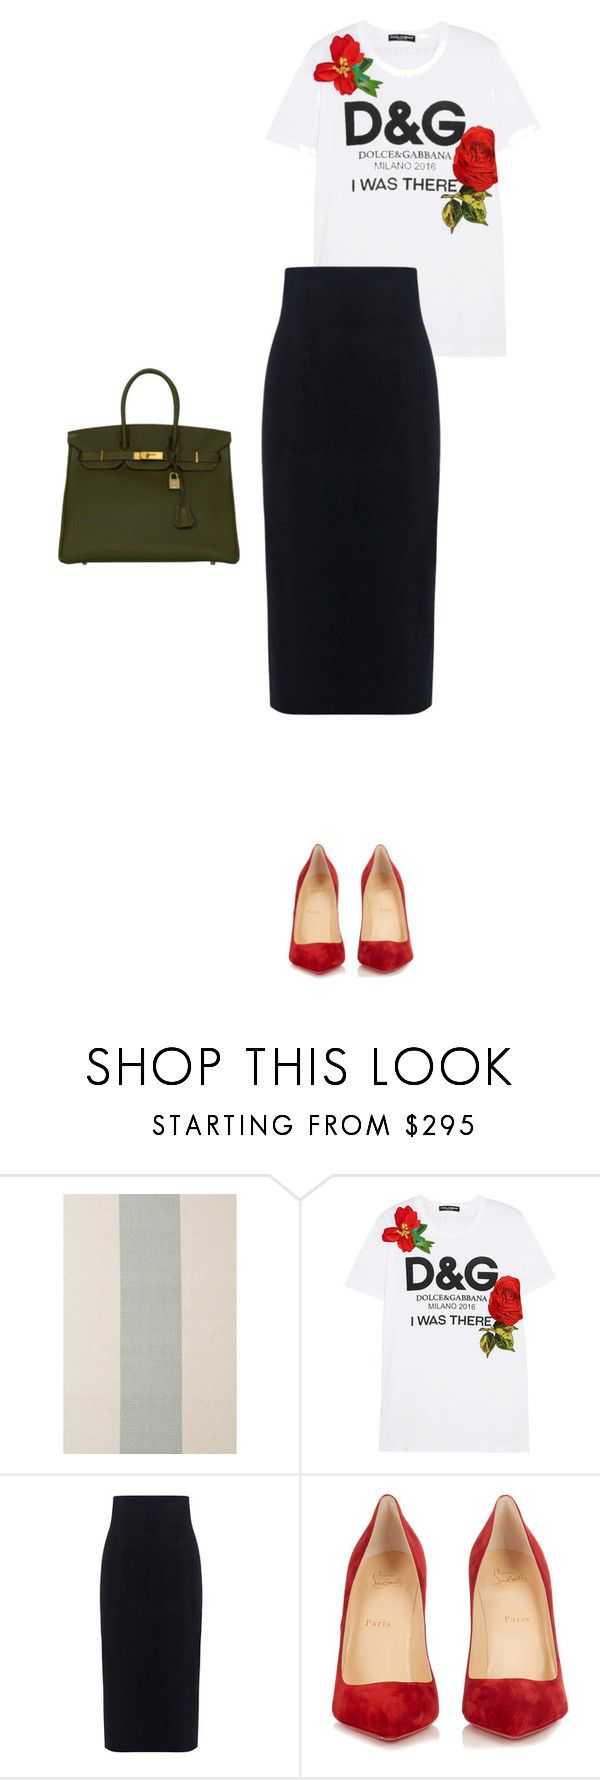 """Красные туфли"" by nadlenko ❤ liked on Polyvore featuring Dolce&Gabbana, 10 Crosby Derek Lam, Christian Louboutin and Hermès"